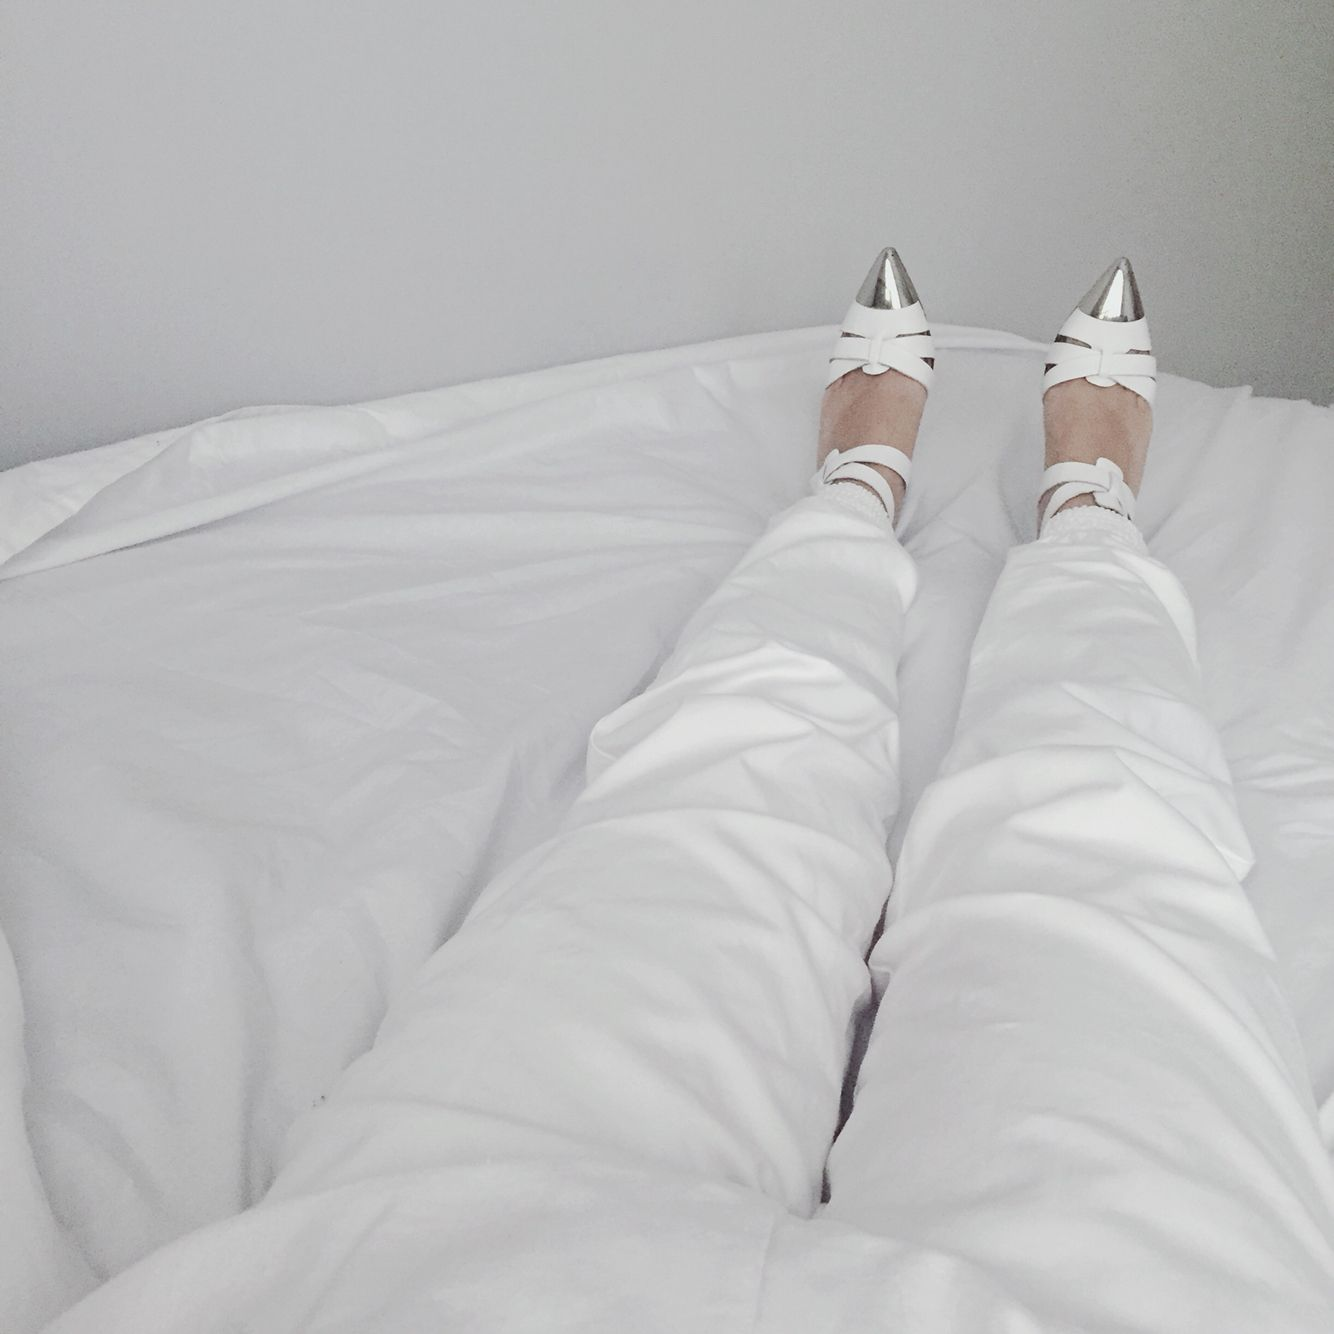 When ya sheets match ya pants